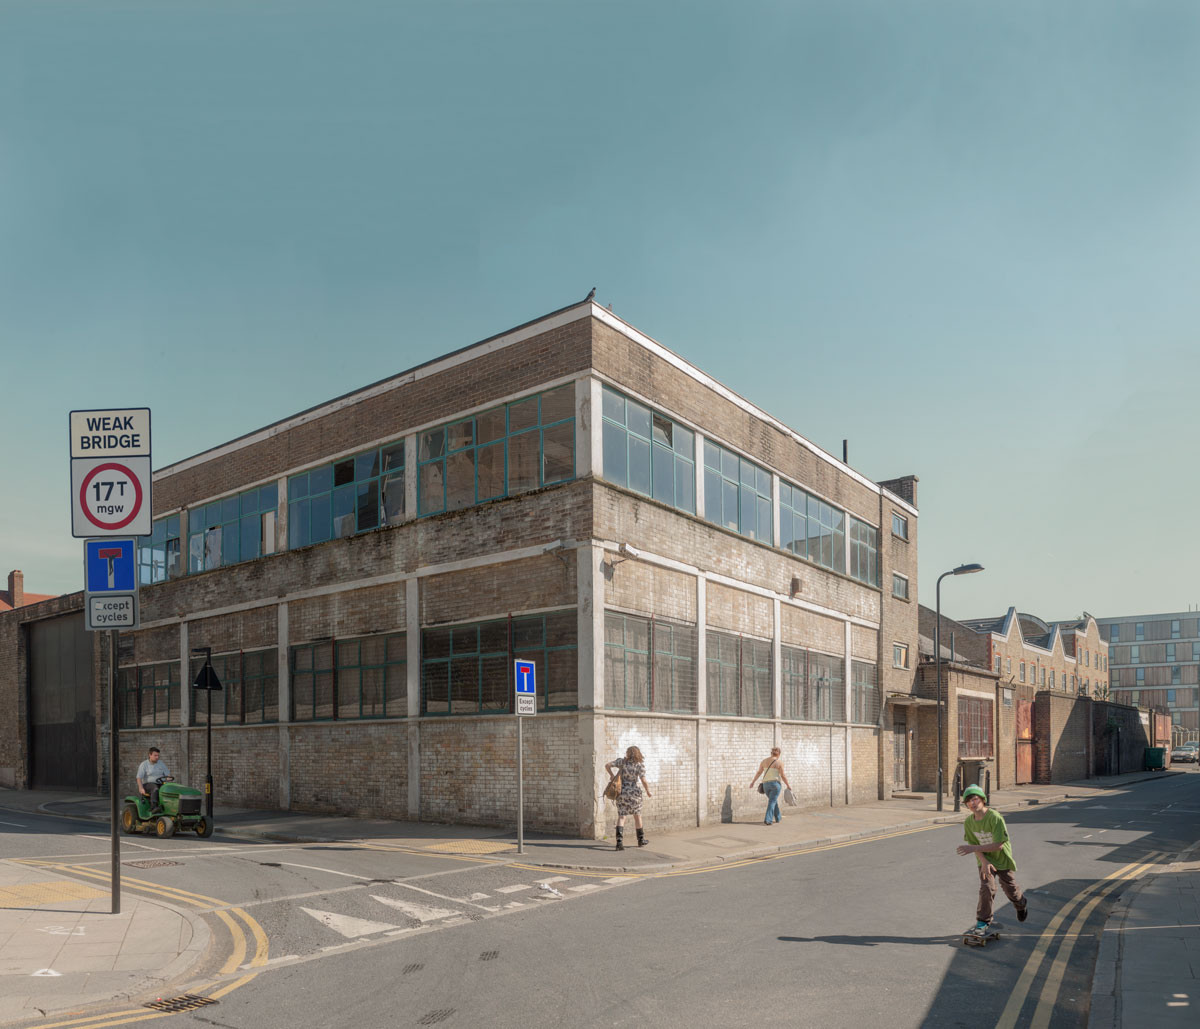 HMP_The-Corners_C.Dorley-Brown_Laburnam-Street-2011_online